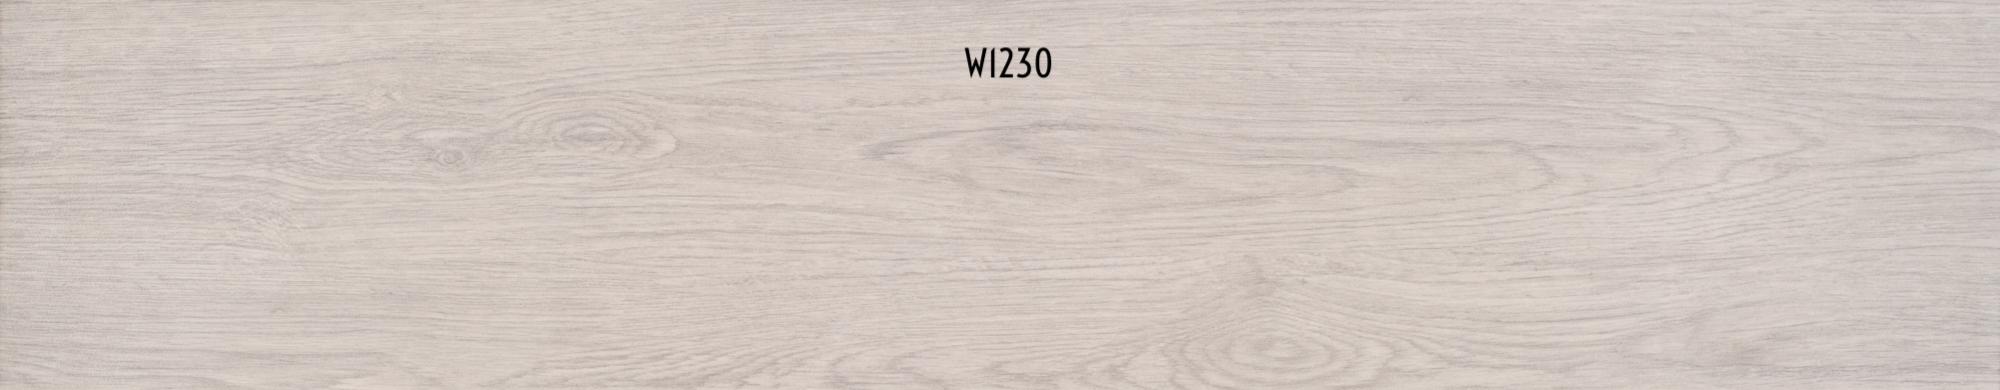 W1230